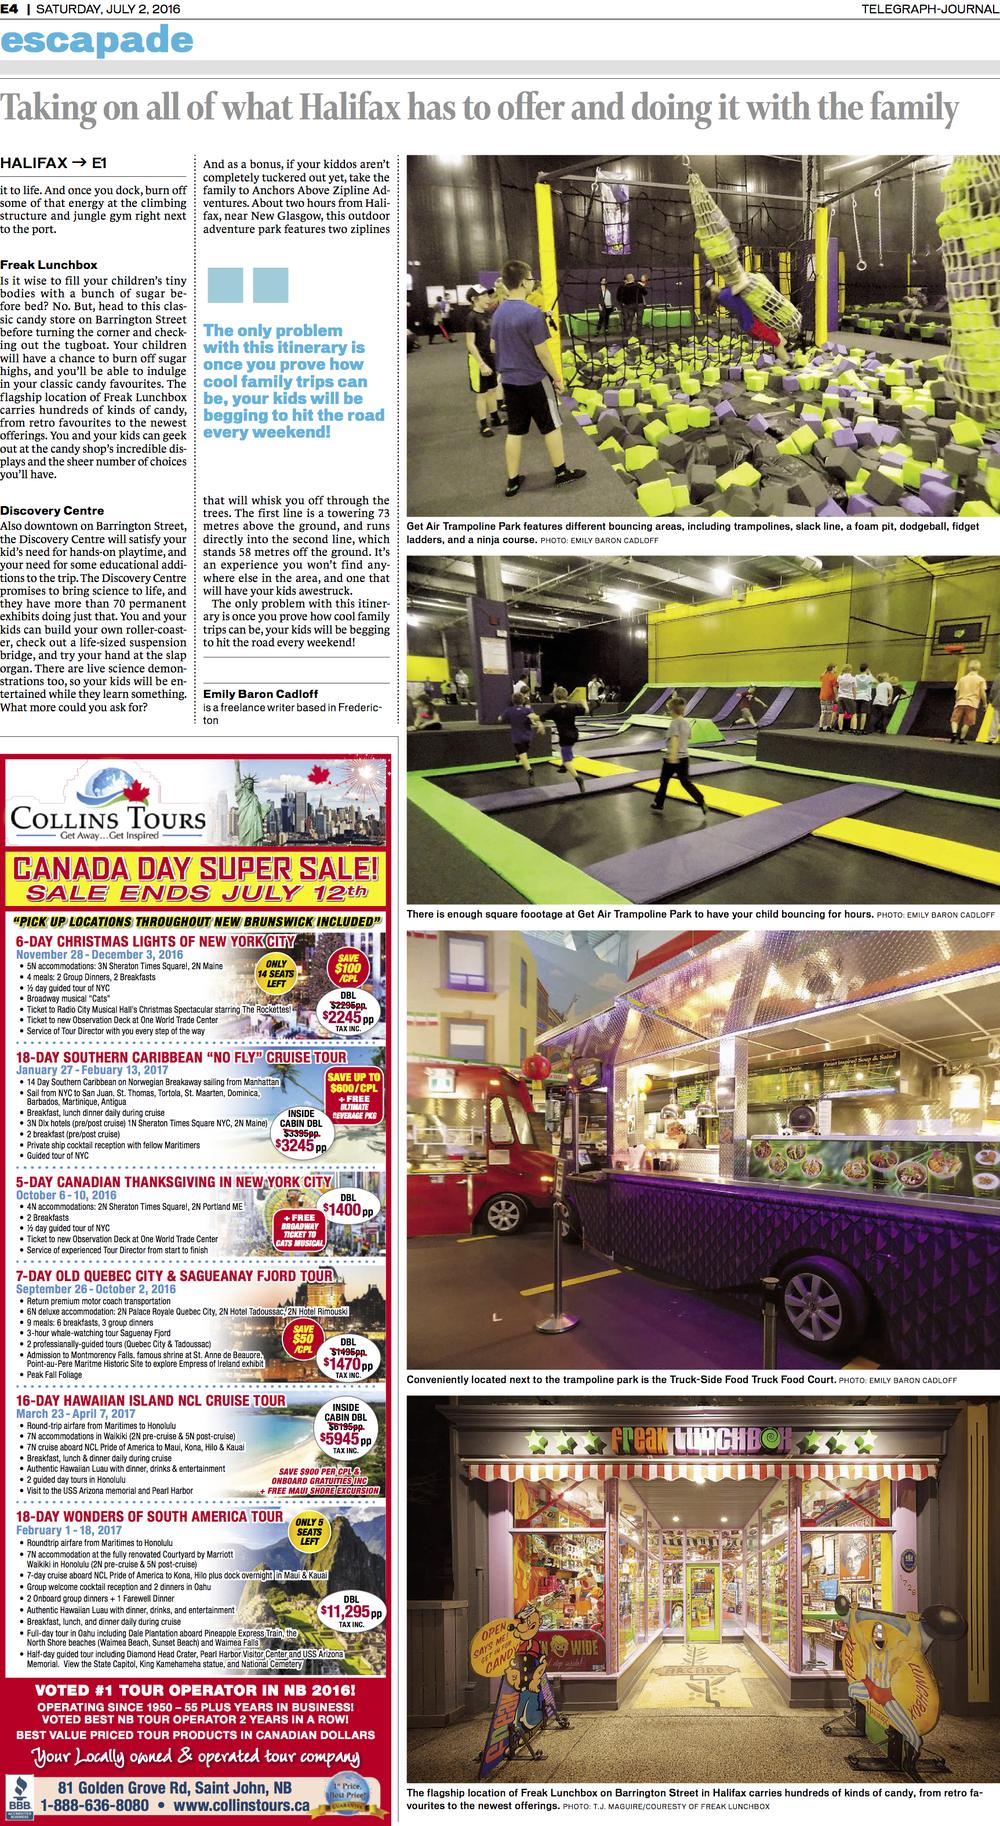 Main page, travel feature: family-friendly Halifax. New Brunswick Telegraph-Journal, July 2016